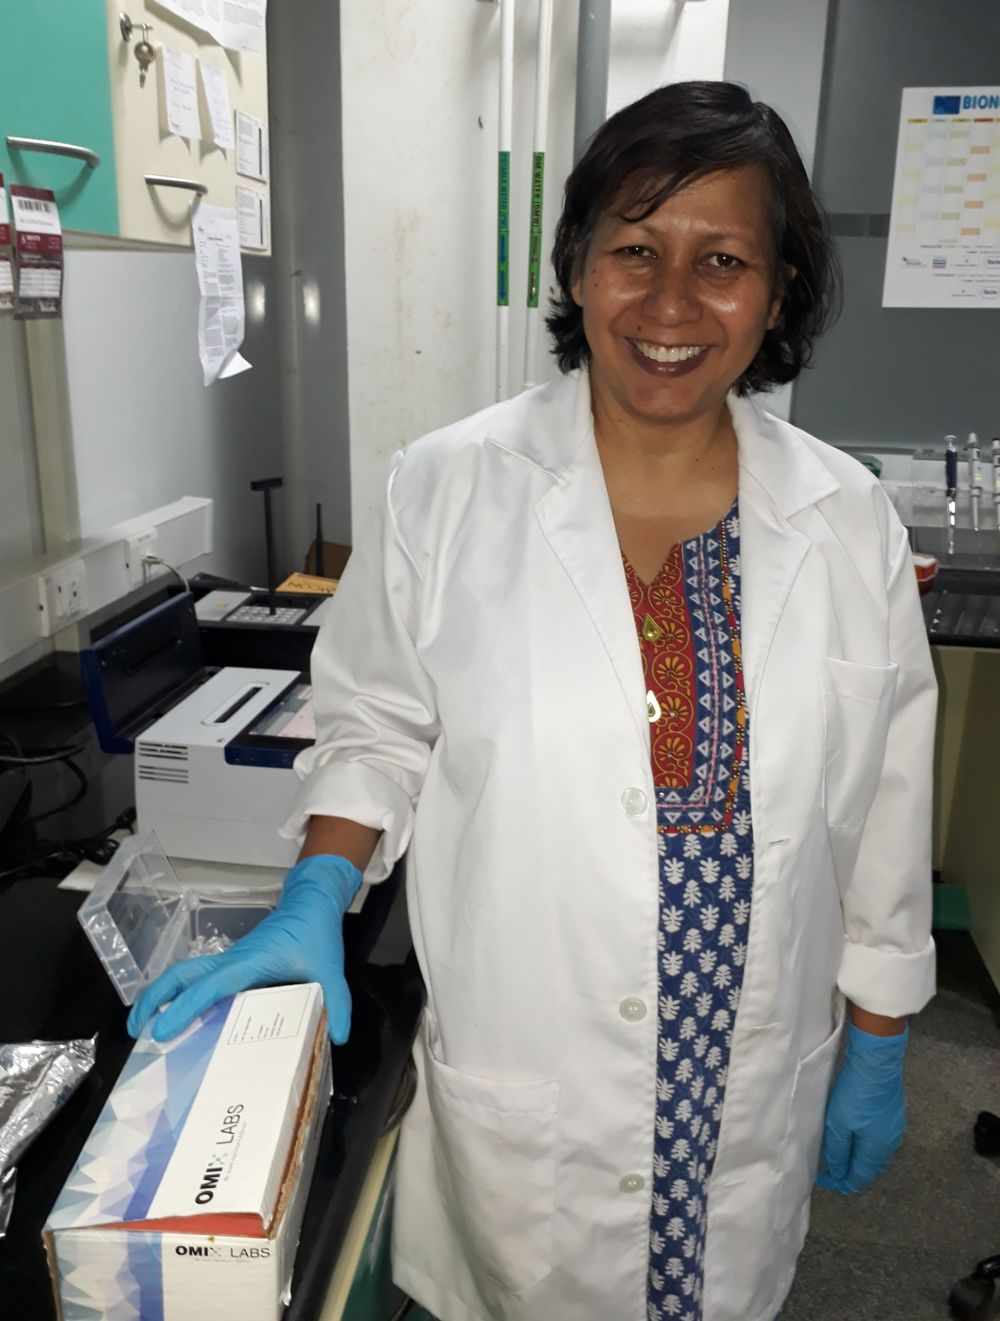 Sudeshna Adak- CEO and Director of OmiX Research and Diagnostics Laboratories Pvt. Ltd.